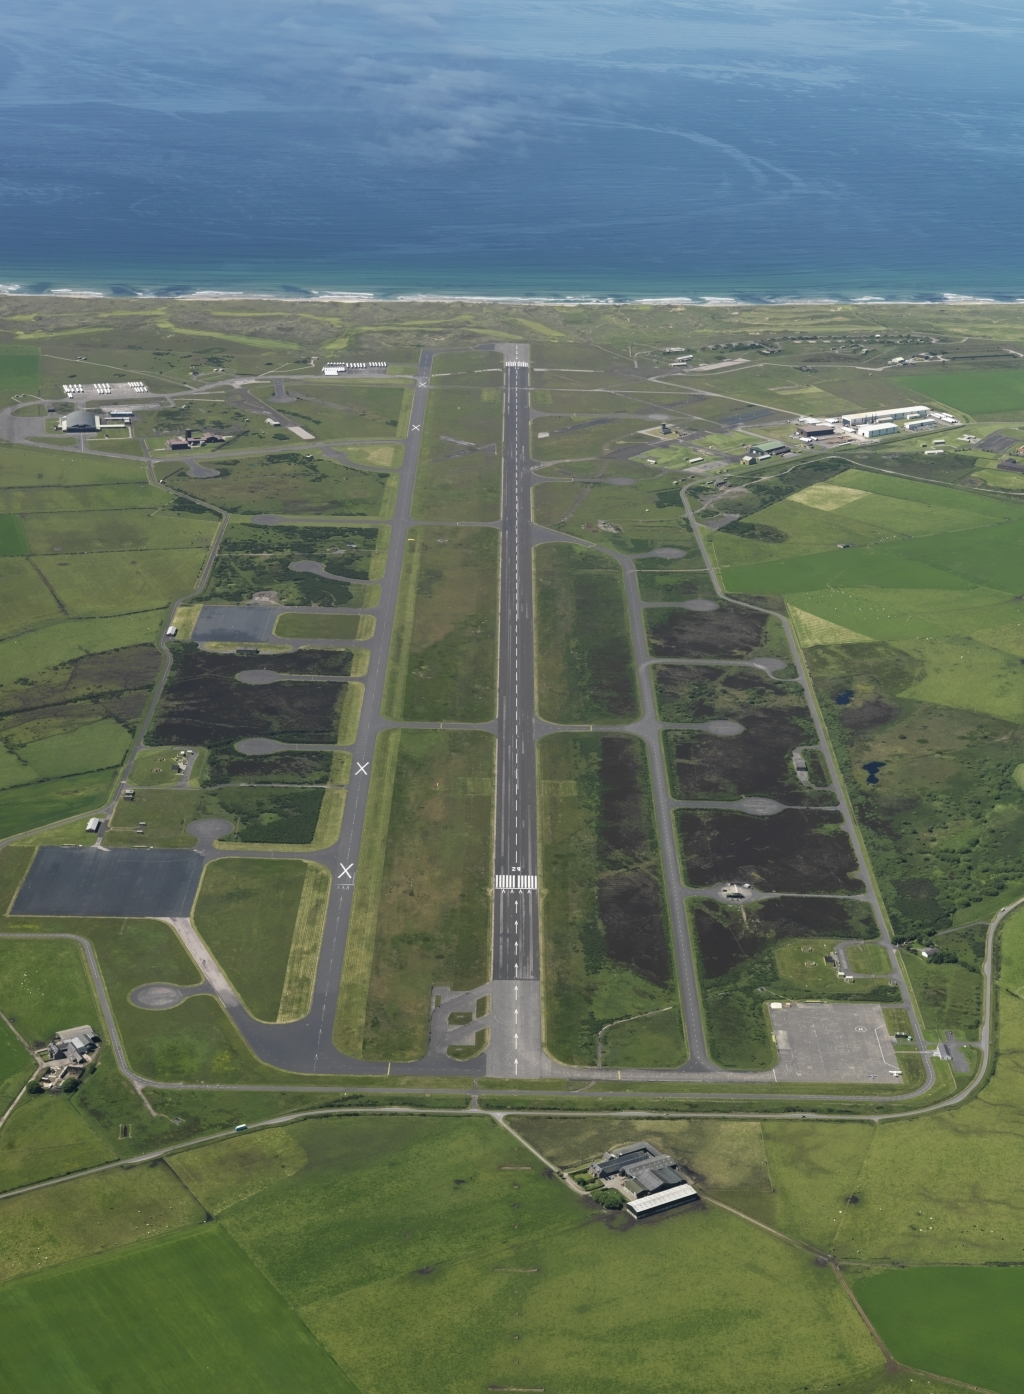 The runway at Machrihanish near Campbeltown